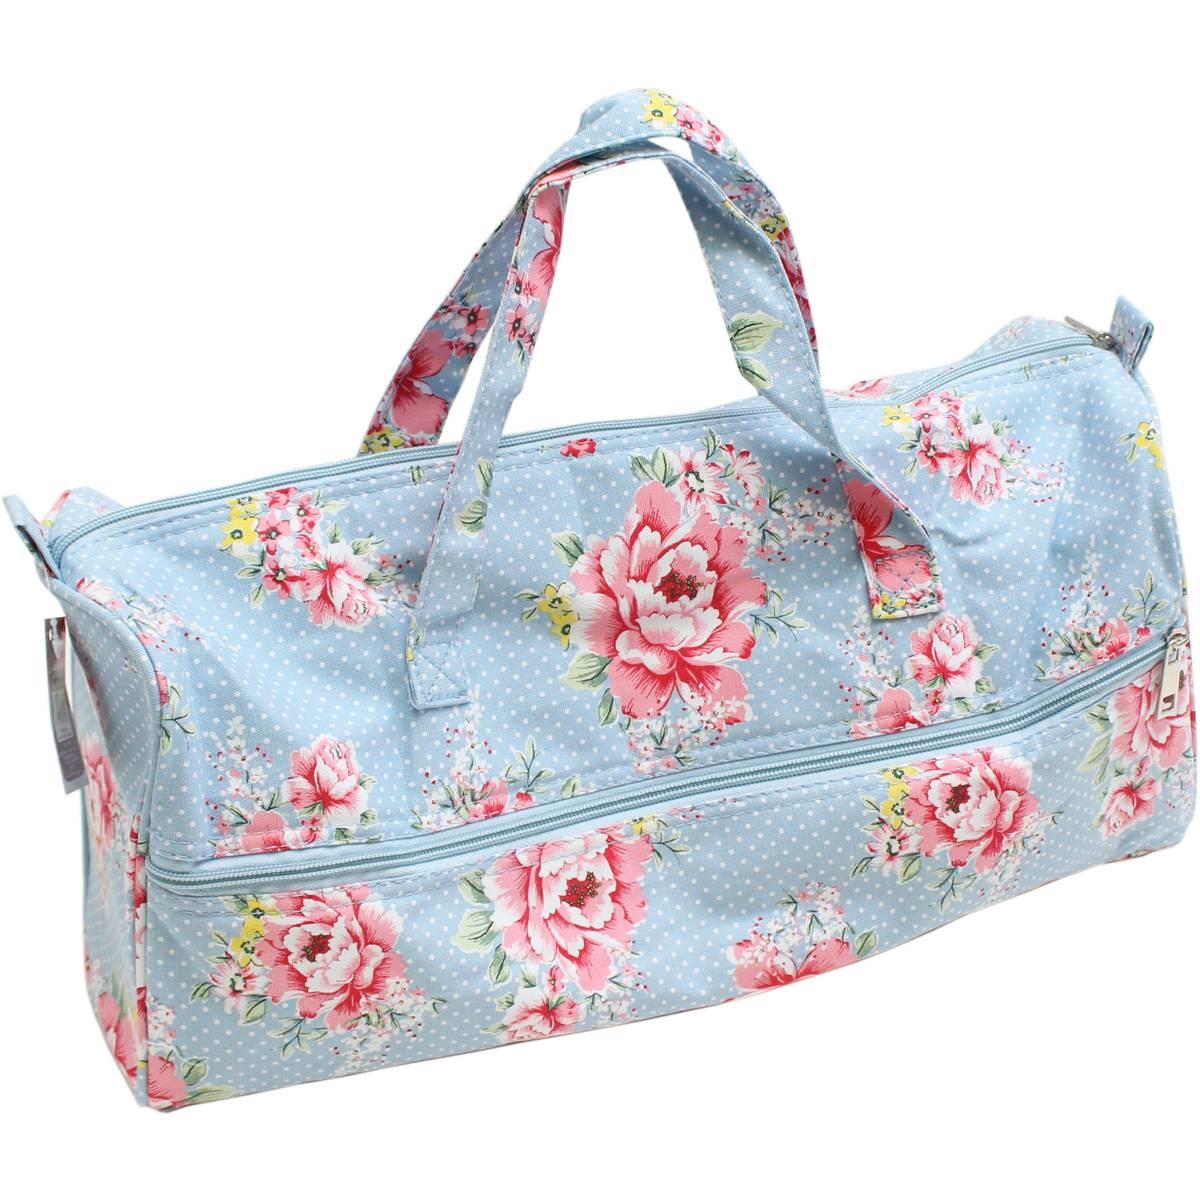 knitting bags beautiful bloom knitting bag | hobbycraft elgyybr